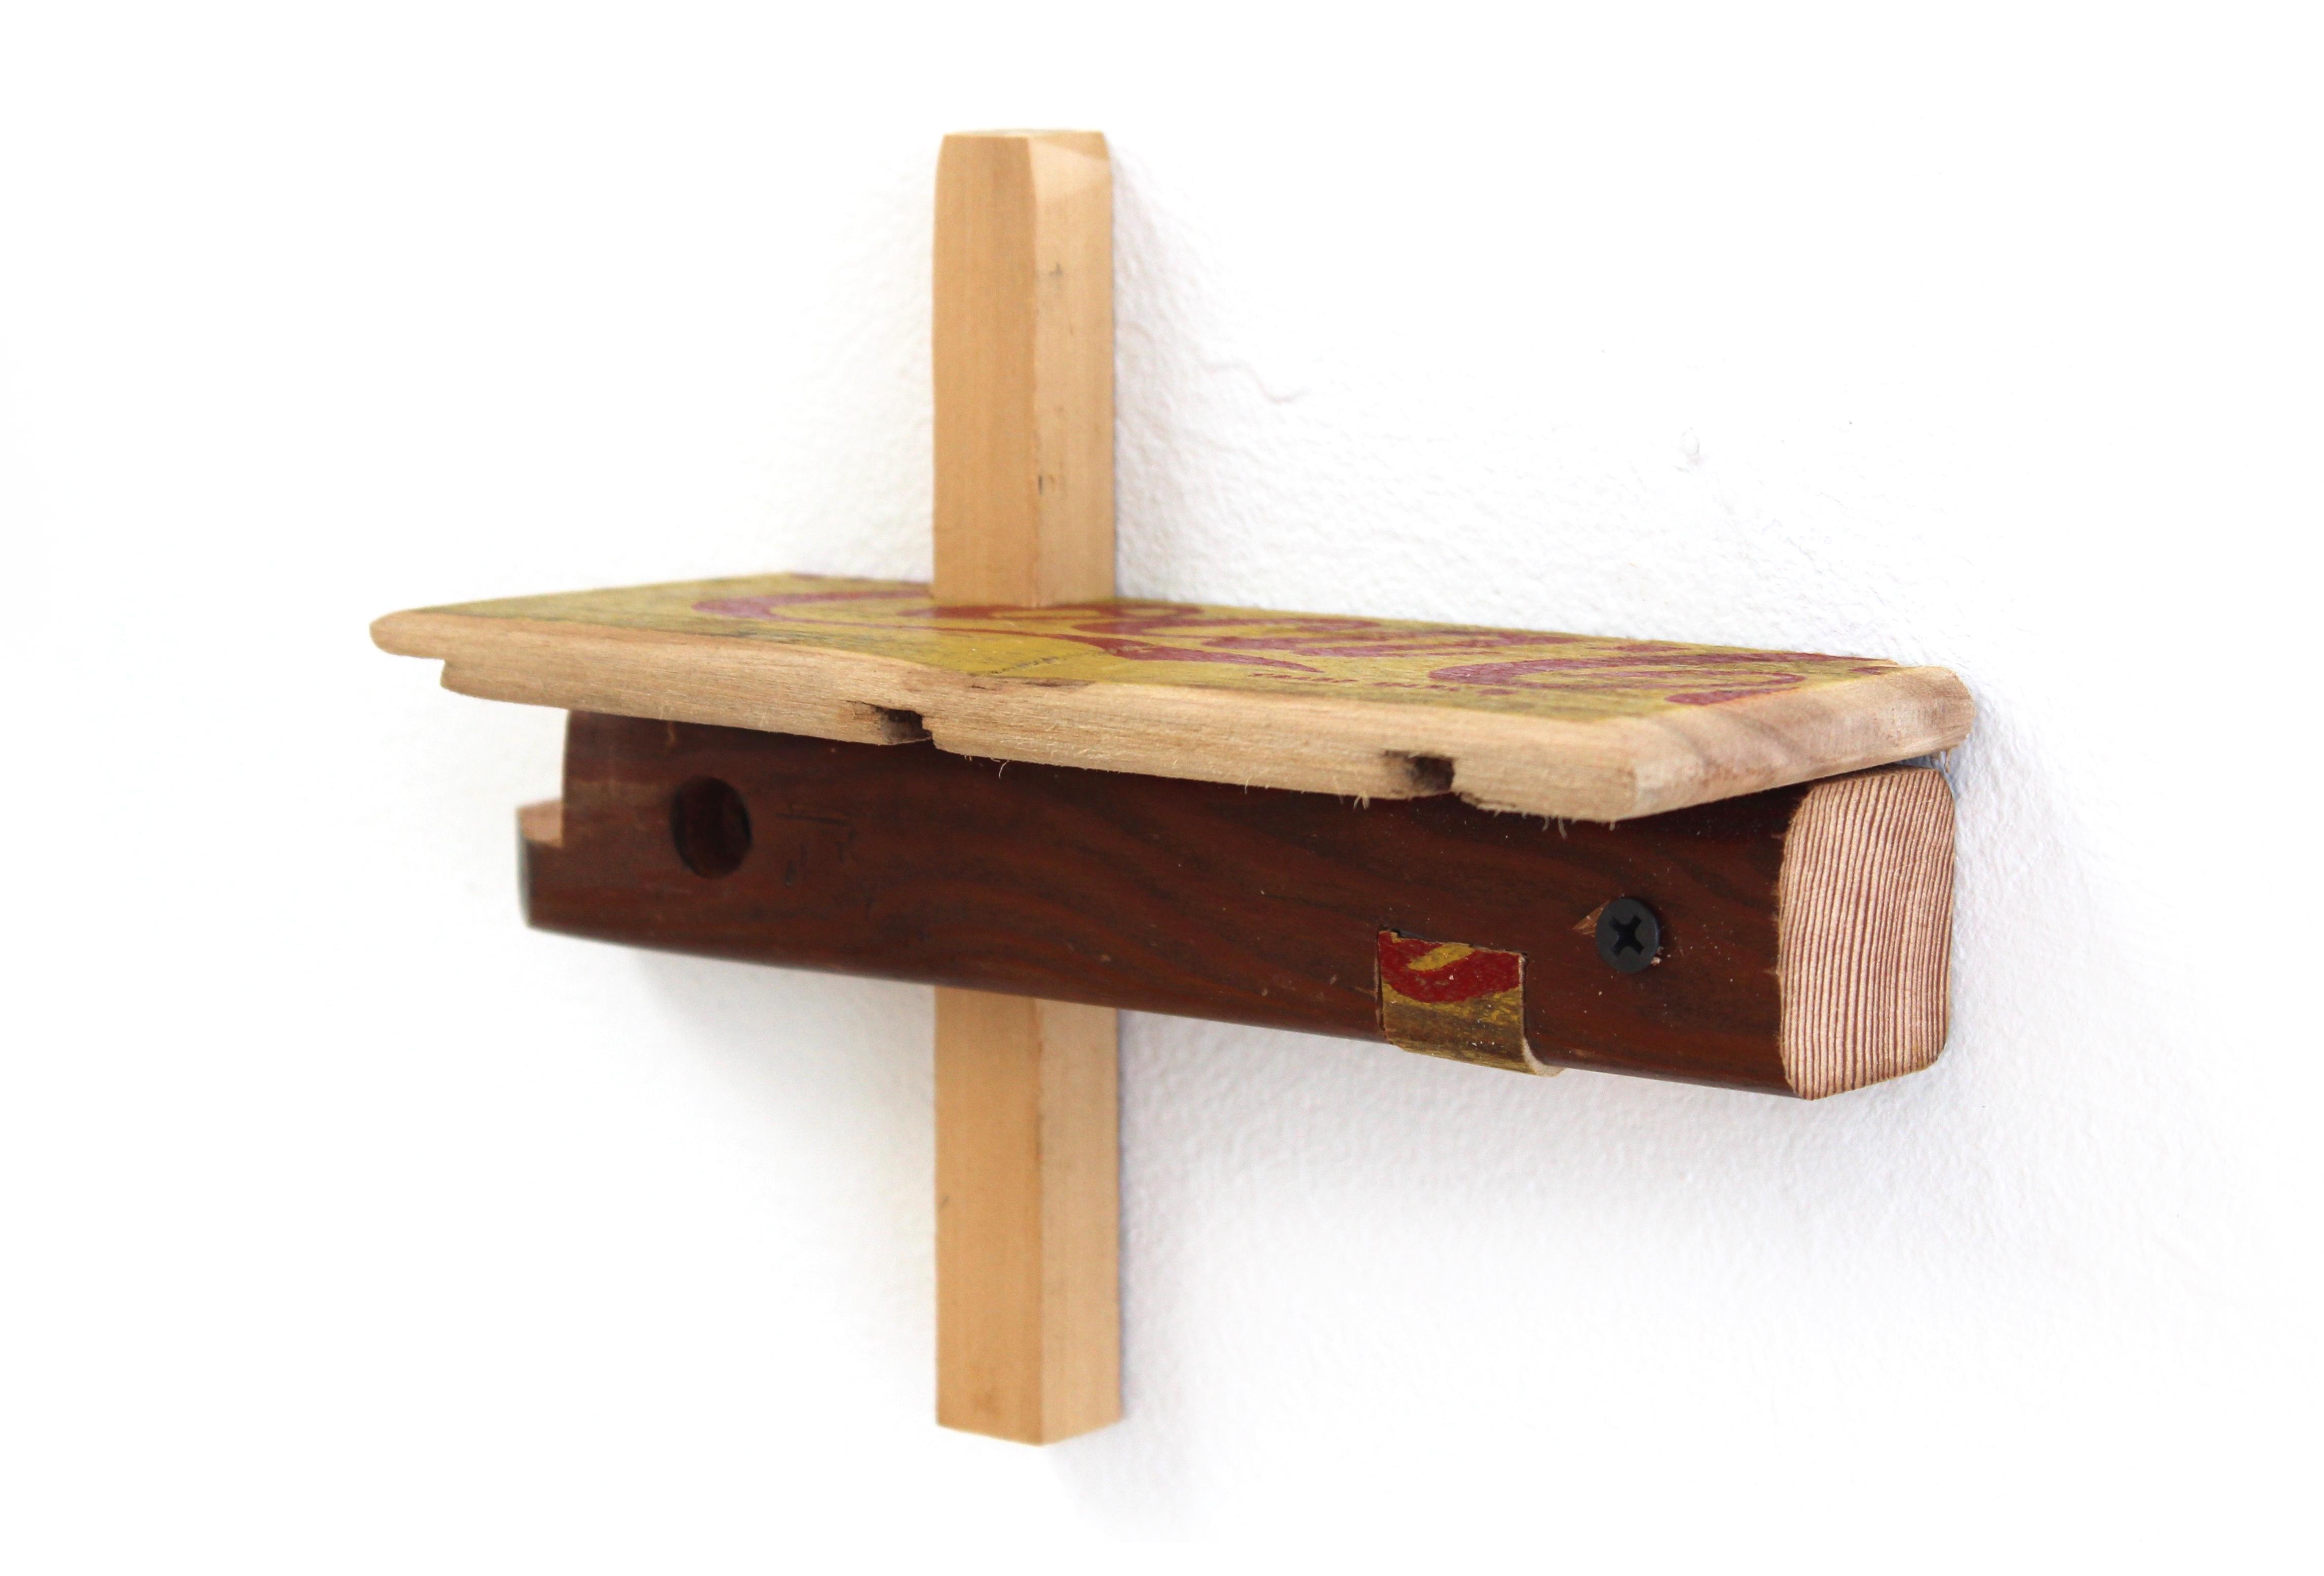 Kevin McNamee-Tweed.<em> Gigi Shelf (alternate)</em>, 2019. Wood with affixed found wood, 6 1/4 x 8 x 3 inches (15.9 x 20.3 x 7.6 cm)